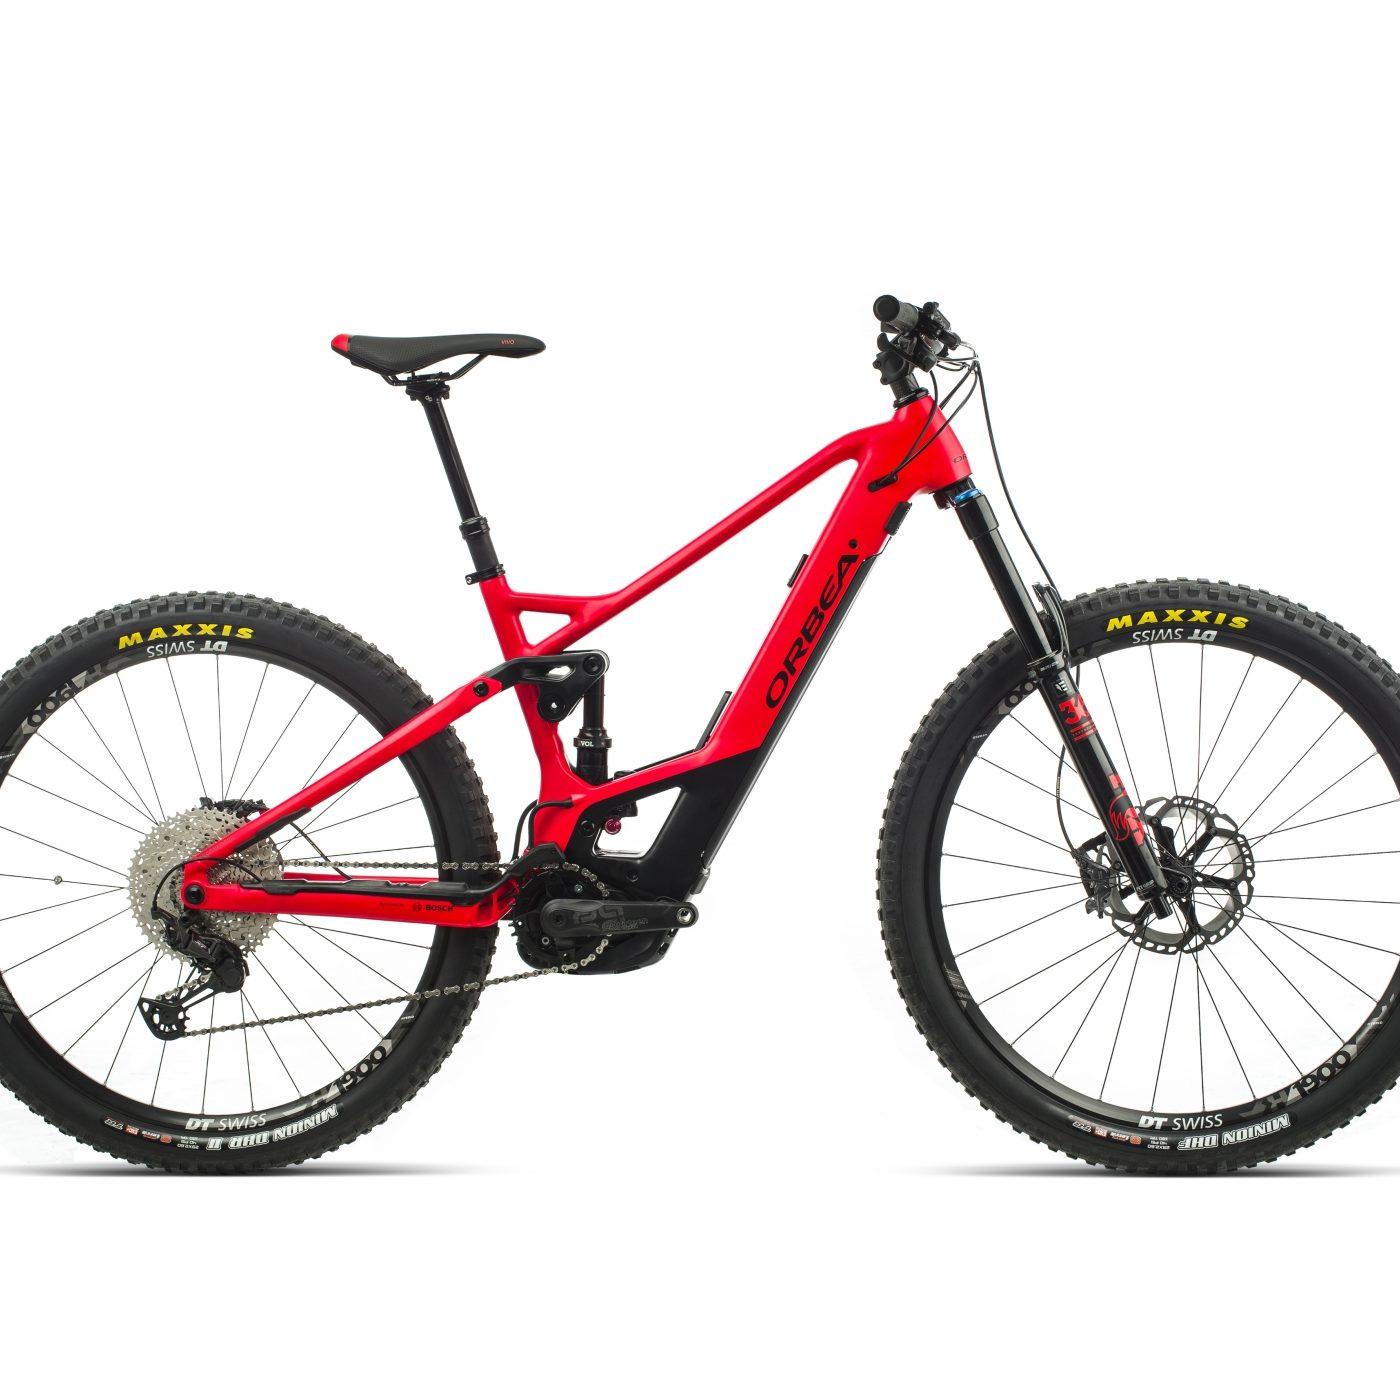 ORBEA WILD FS H10 eBike - BRIGHTRED /ZWART (DOF) @G-Bikes